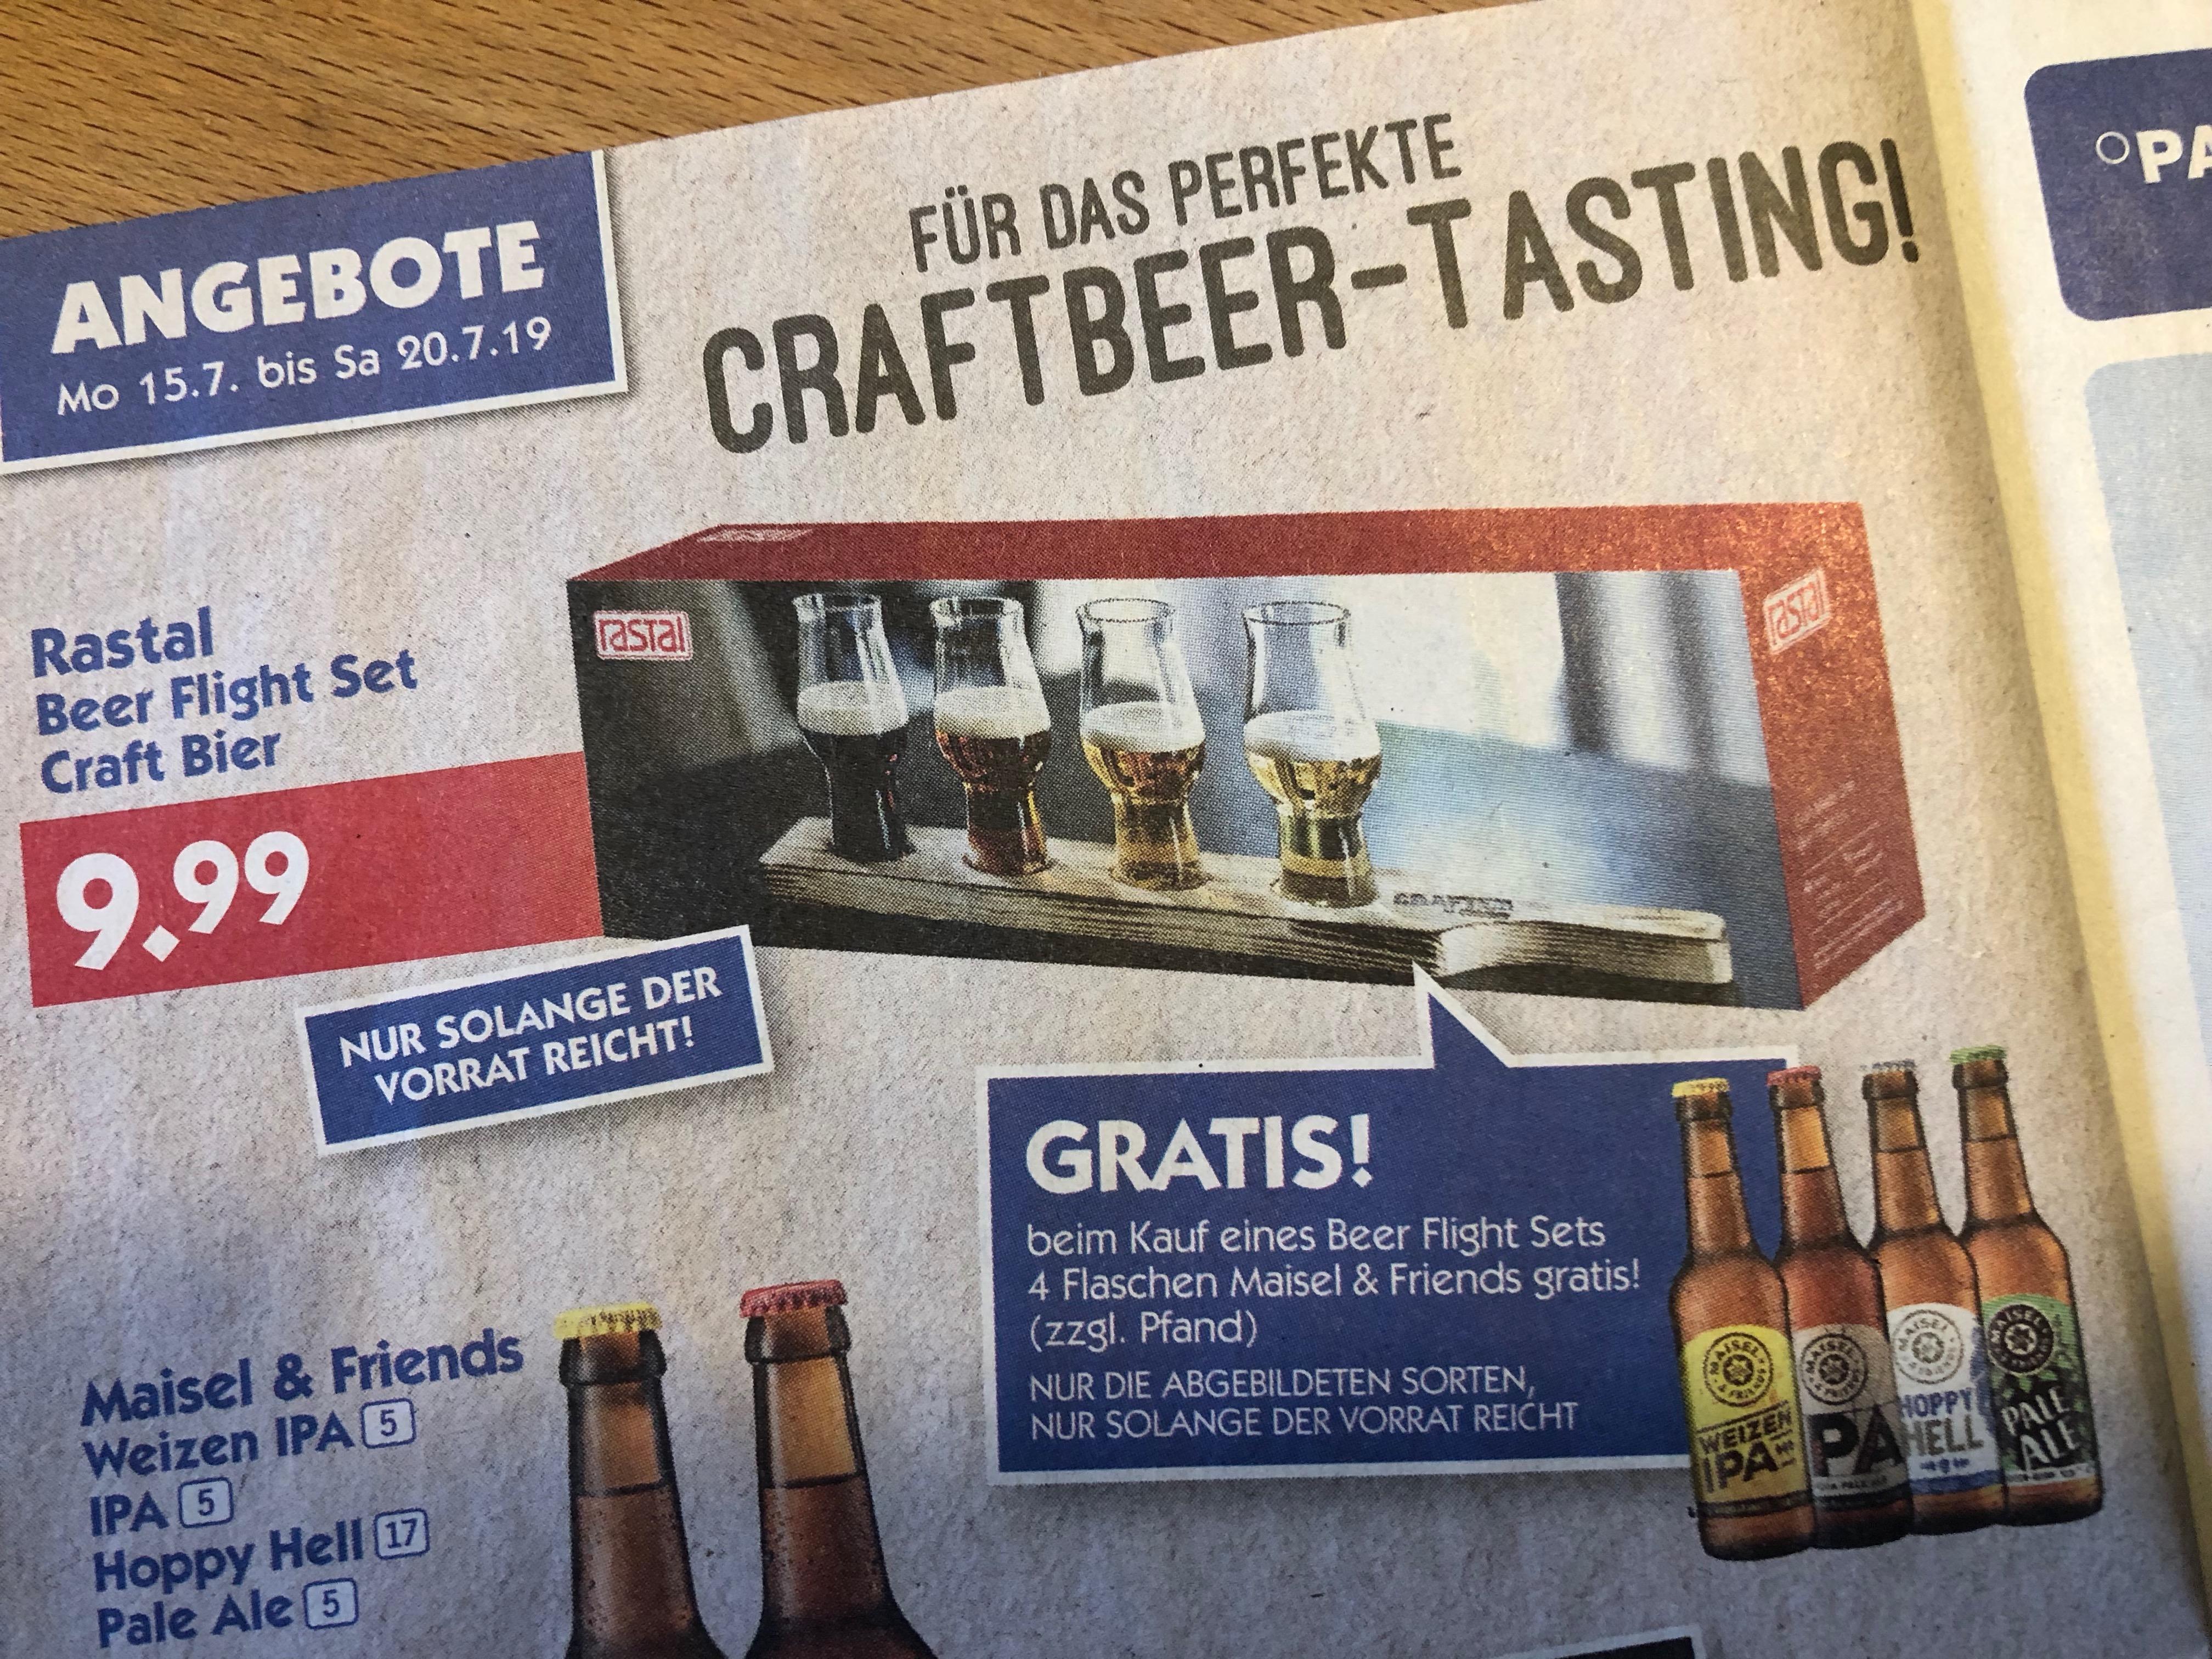 [HOL' AB!] Beer Flight Set - Rastal Craft Bier Tasting Set + 4 Flaschen Mail & Friends